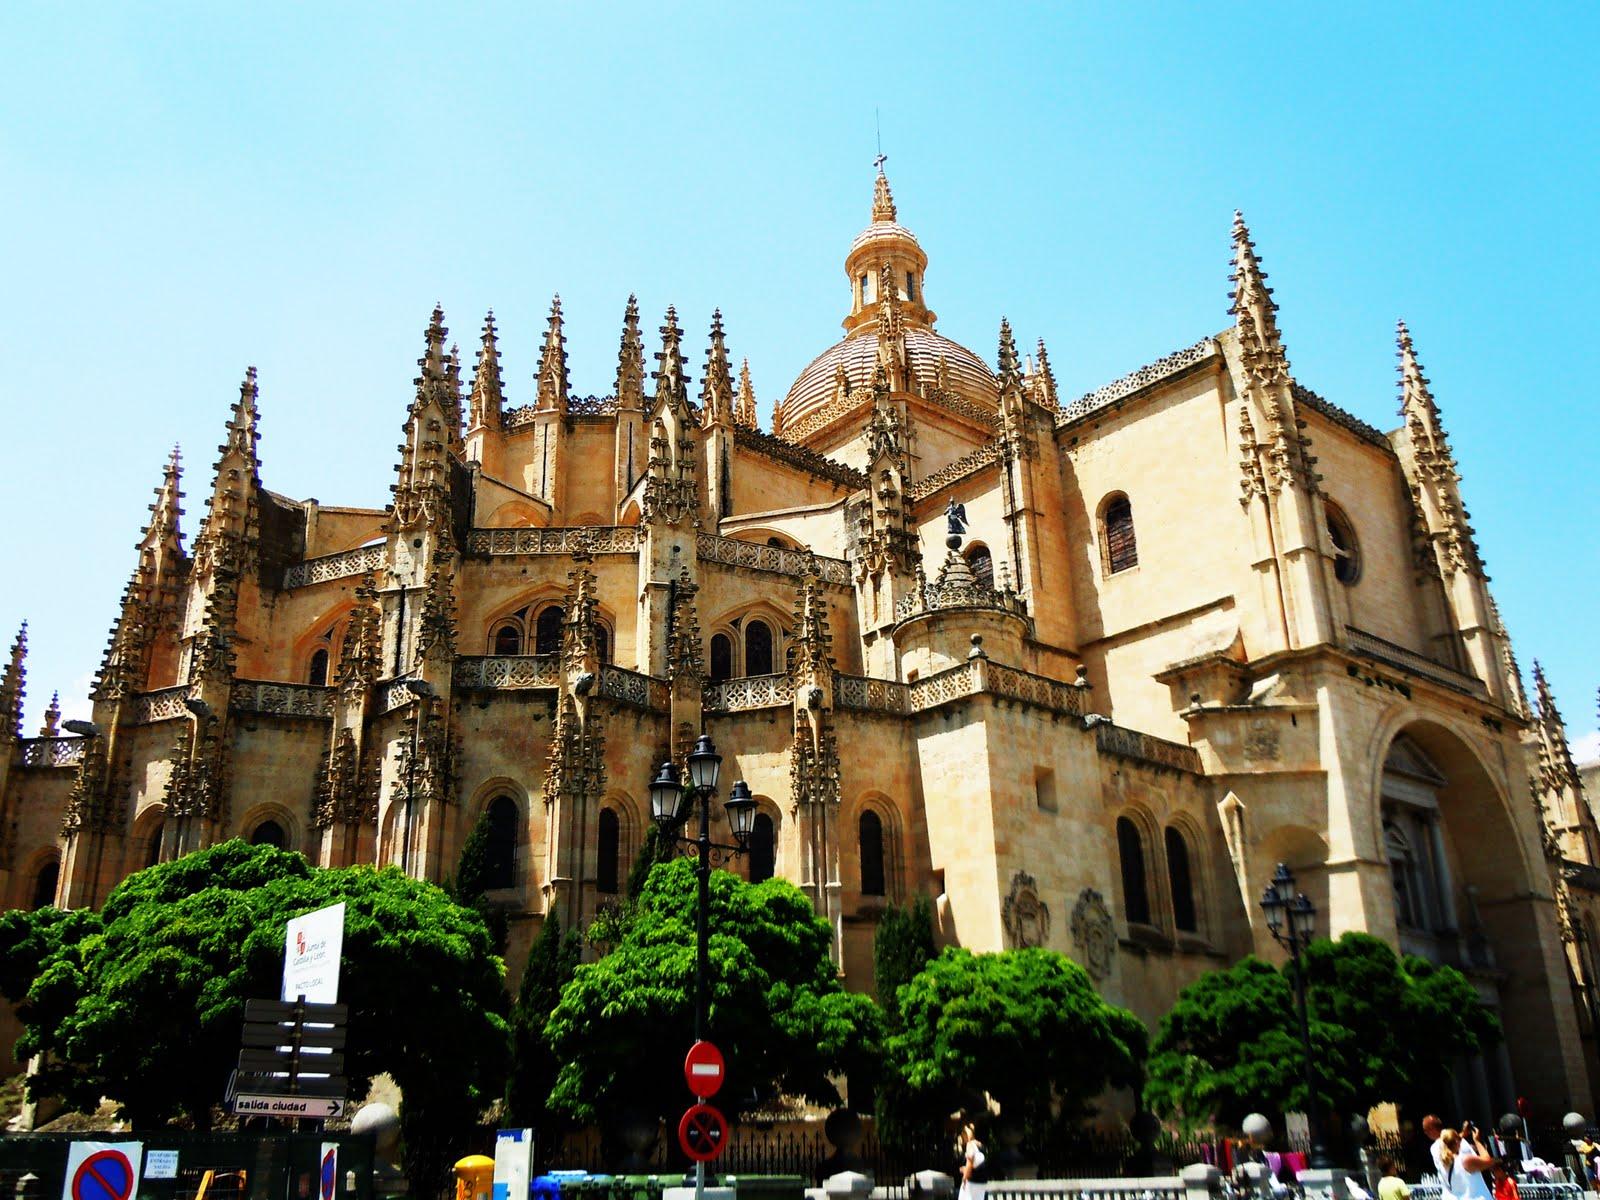 Segovia Spain  city photos gallery : Spanish Adventure: Segovia, Spain